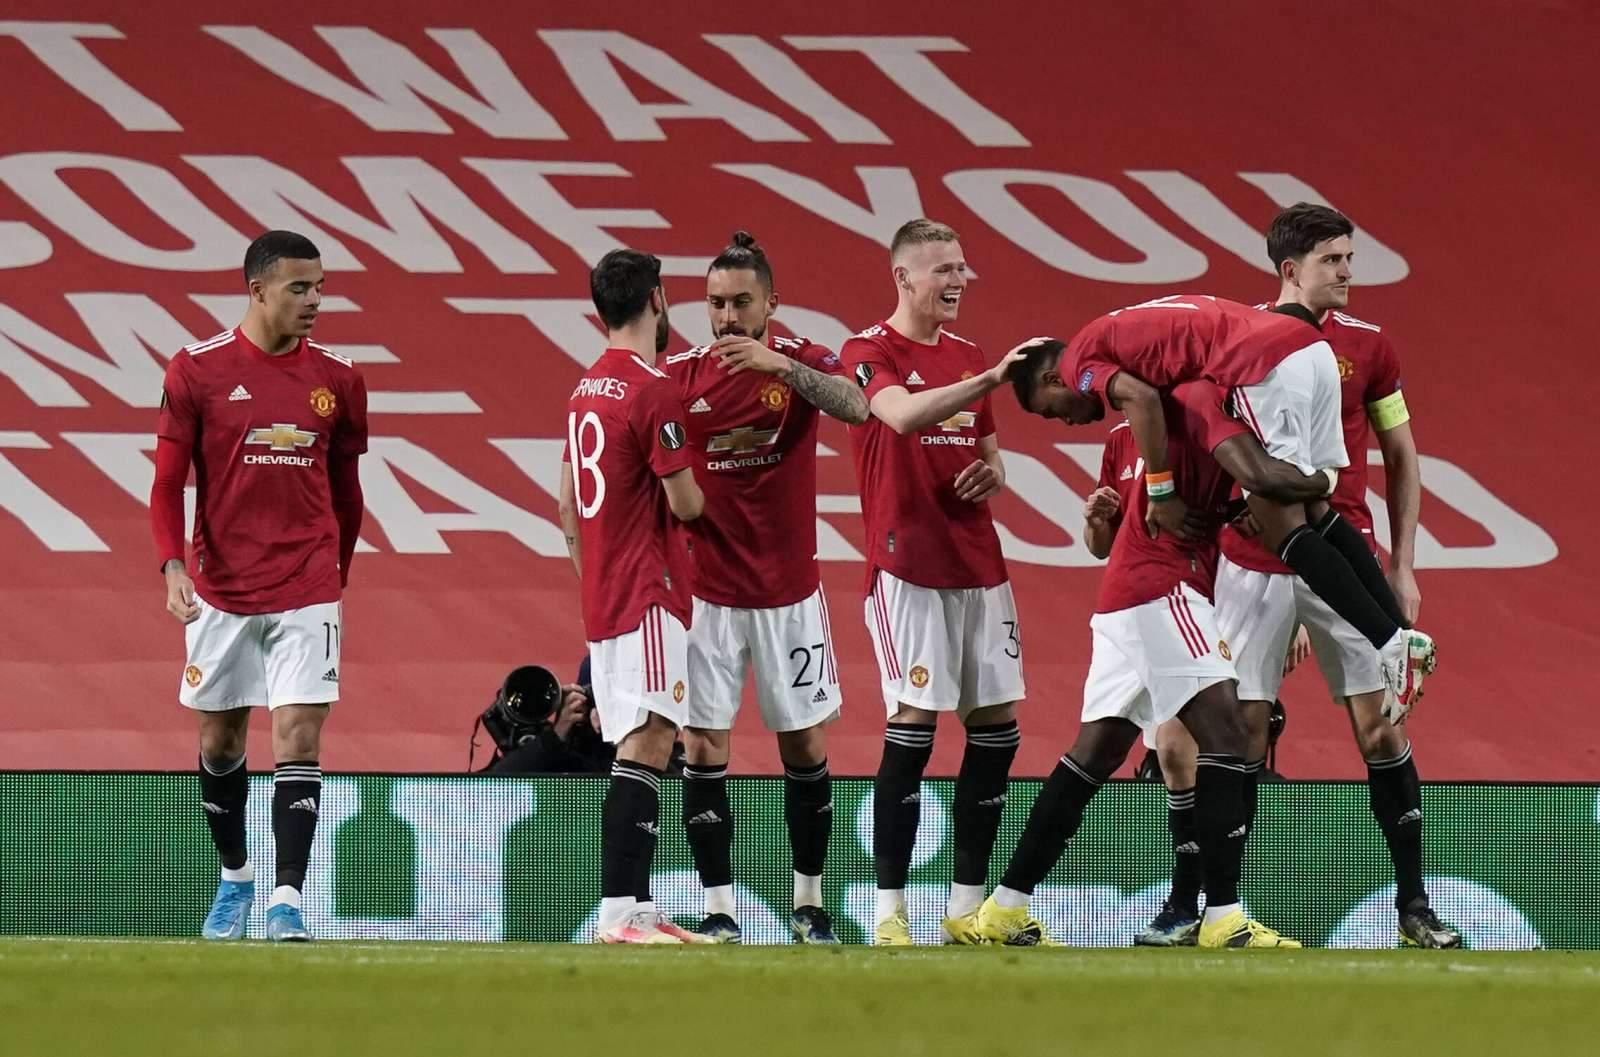 Астон Вилла - Манчестер Юнайтед: где смотреть прямую трансляцию онлайн